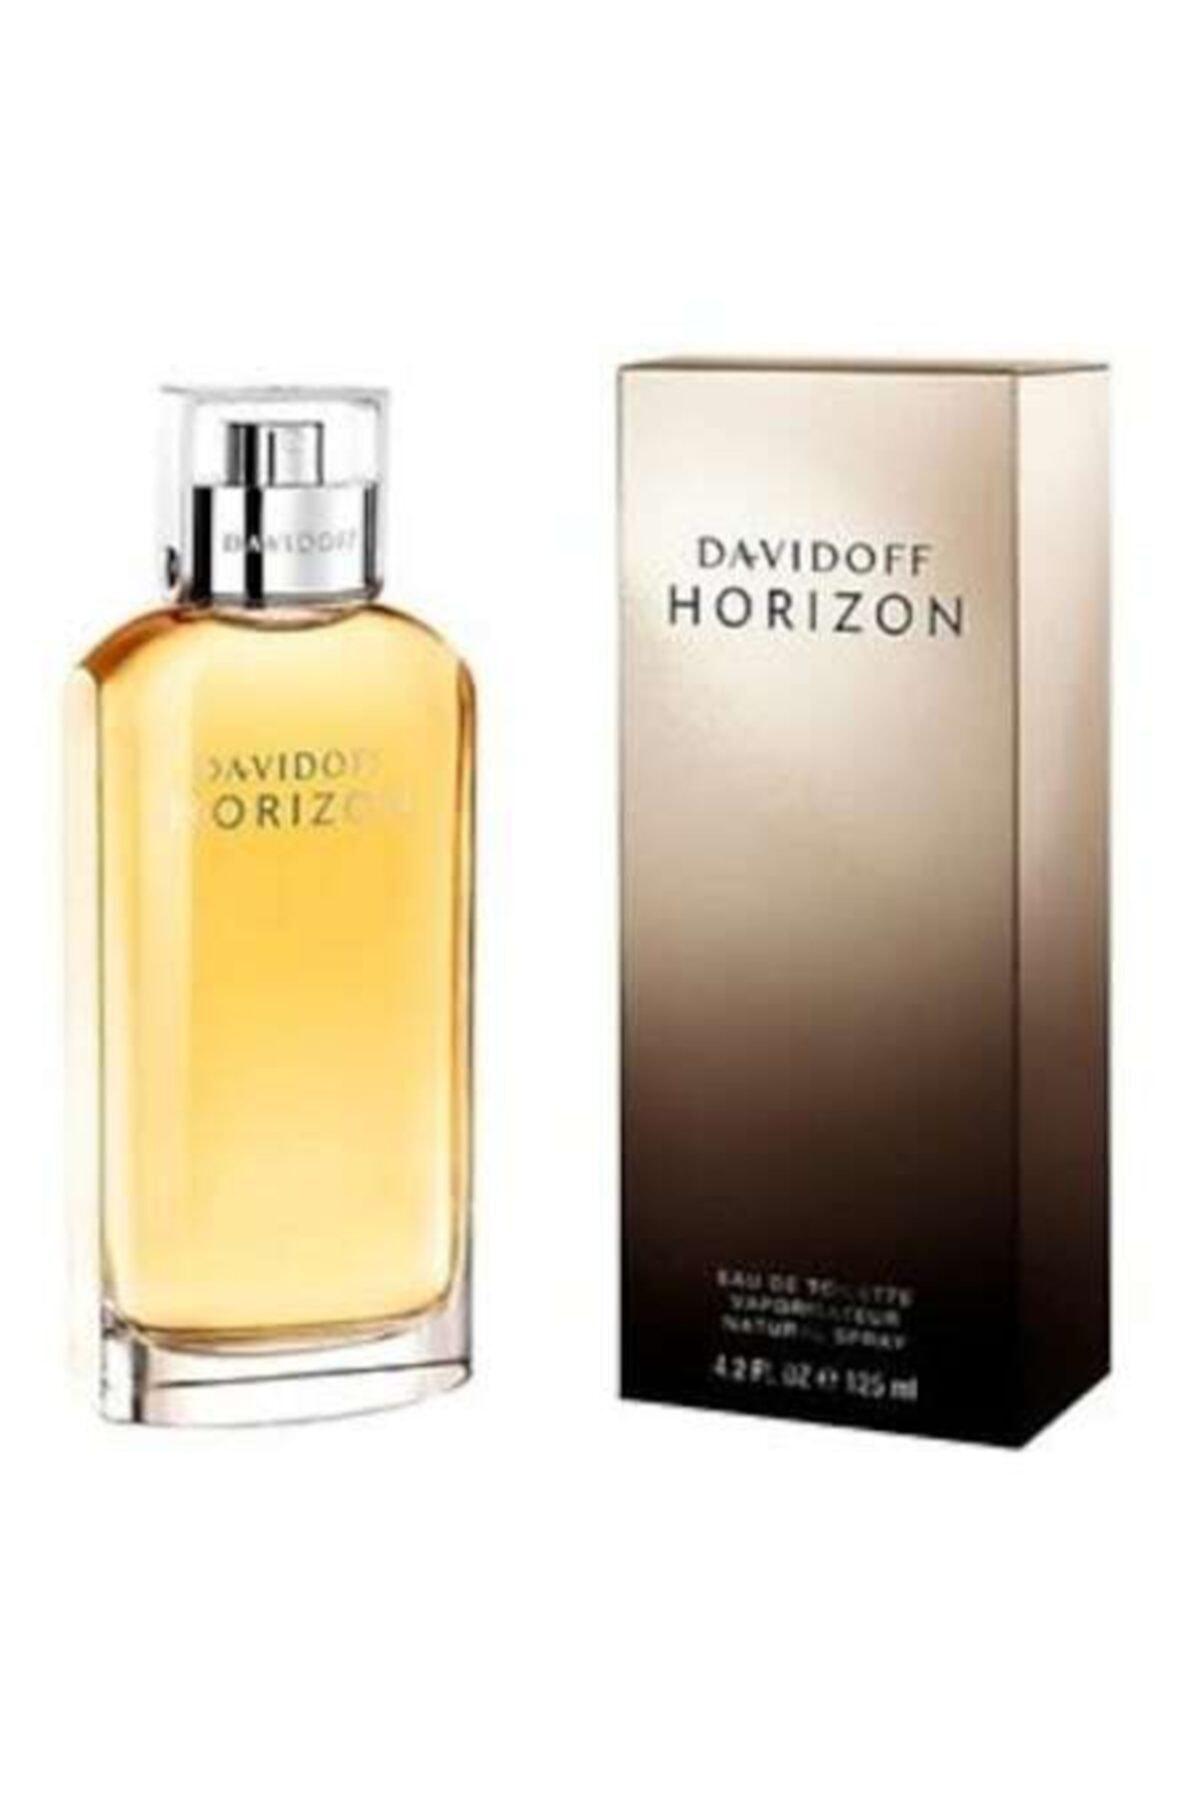 Davidoff Davıdoff Horızon Edt 125ml 1